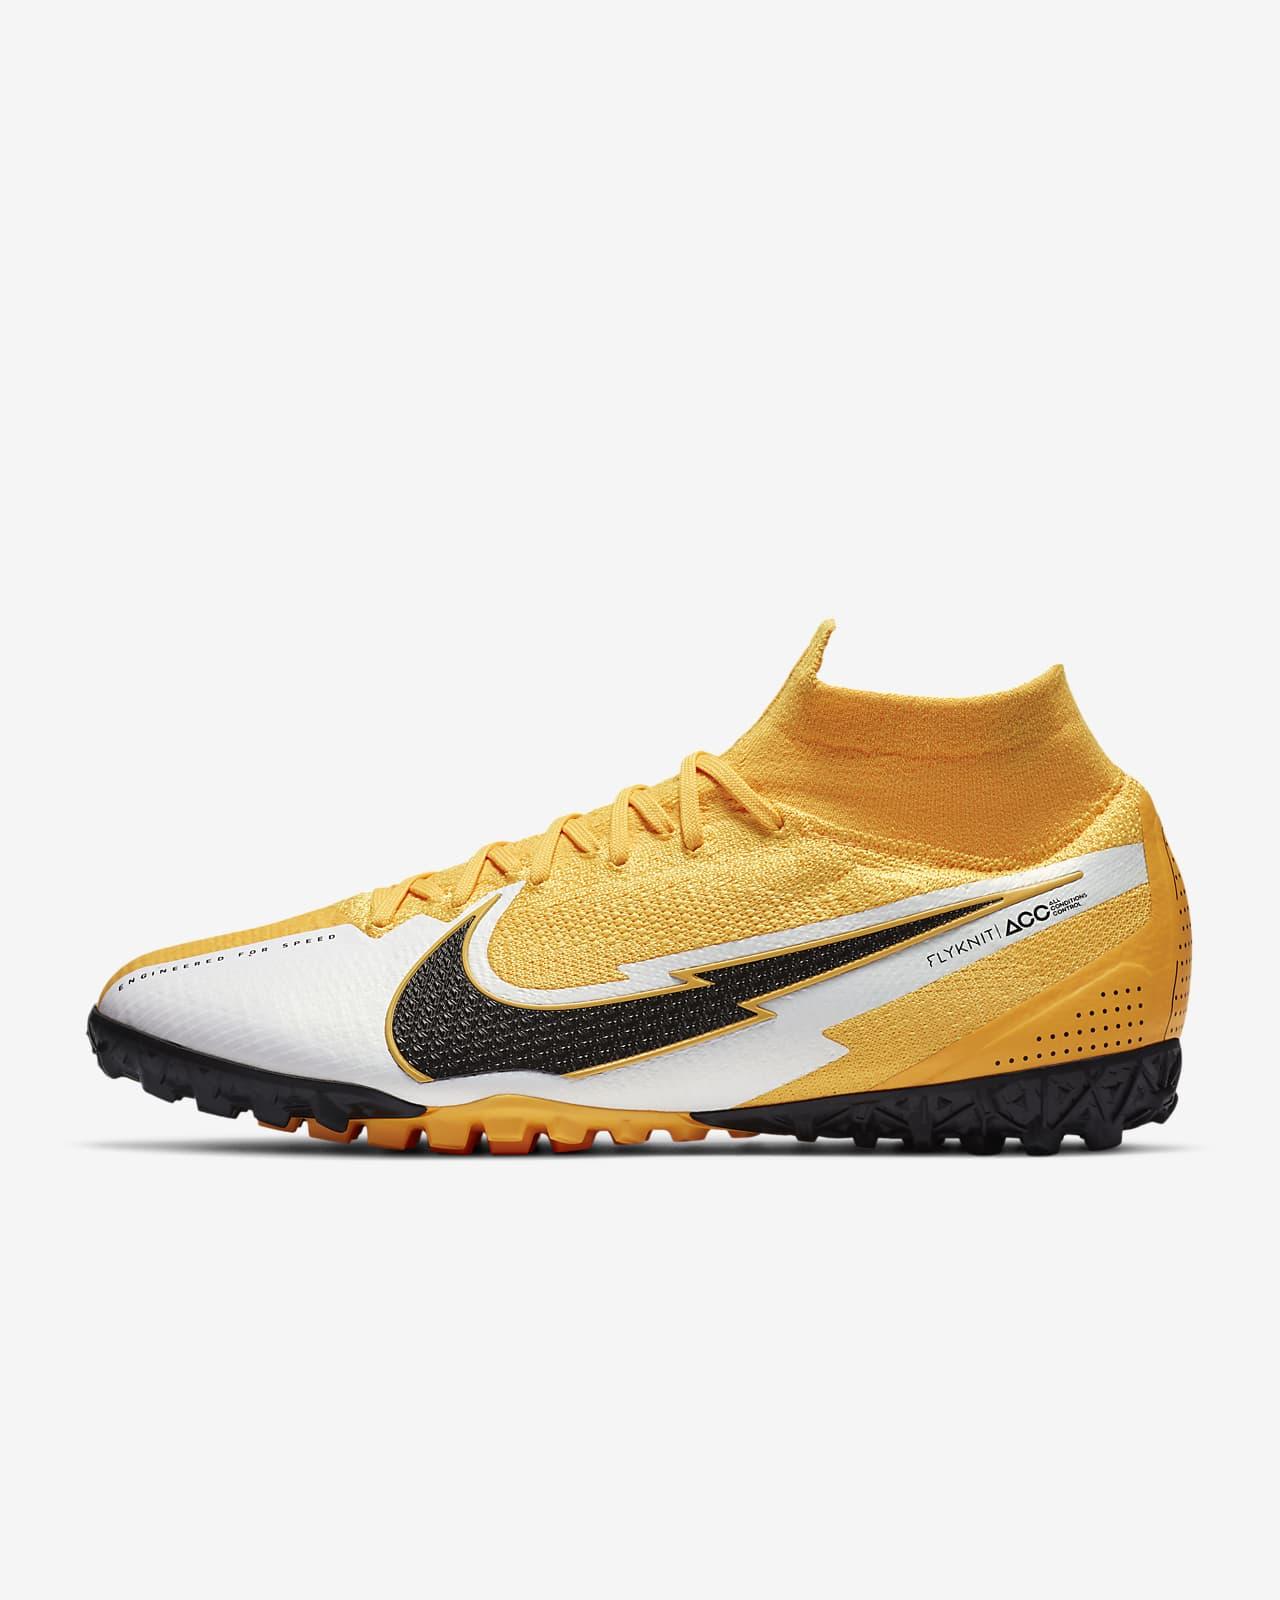 Nike Mercurial Superfly 7 Elite TF Artificial-Turf Soccer Shoe